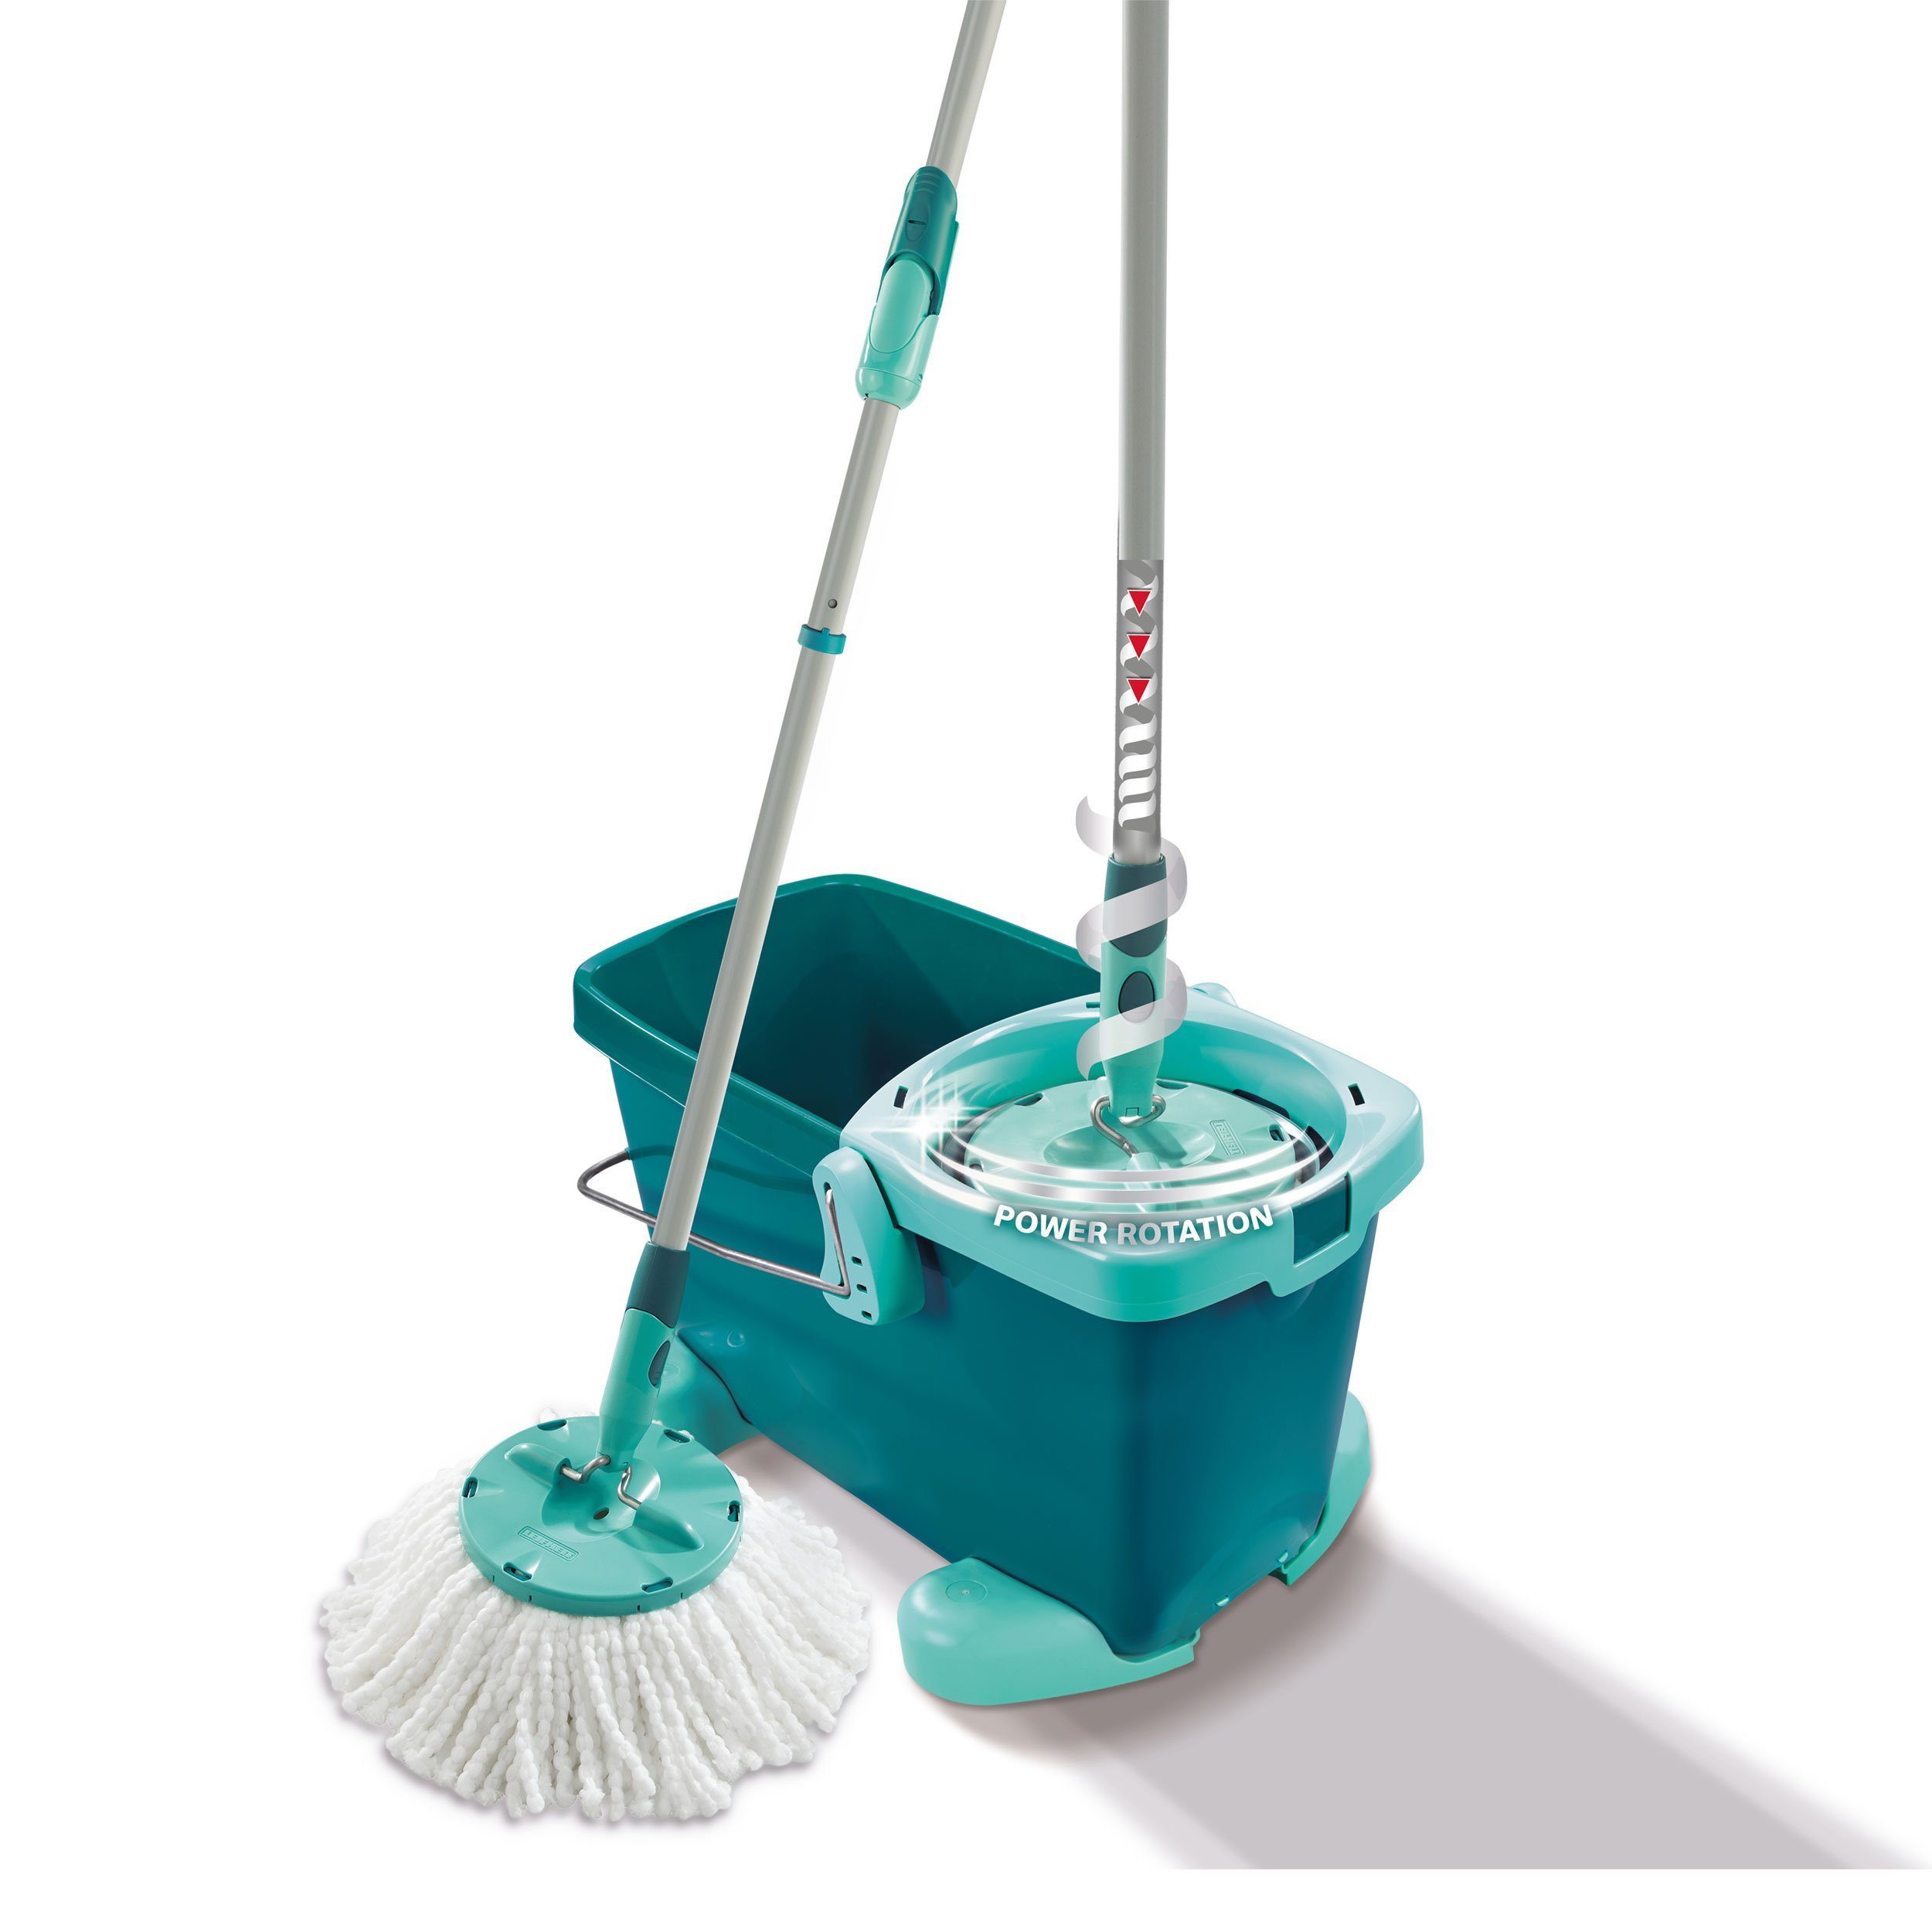 Leifheit Set Clean Twist Mop with Rolling Cart, Floor Cleaner, Mop, Mop Bucket, Mint Green, 52052